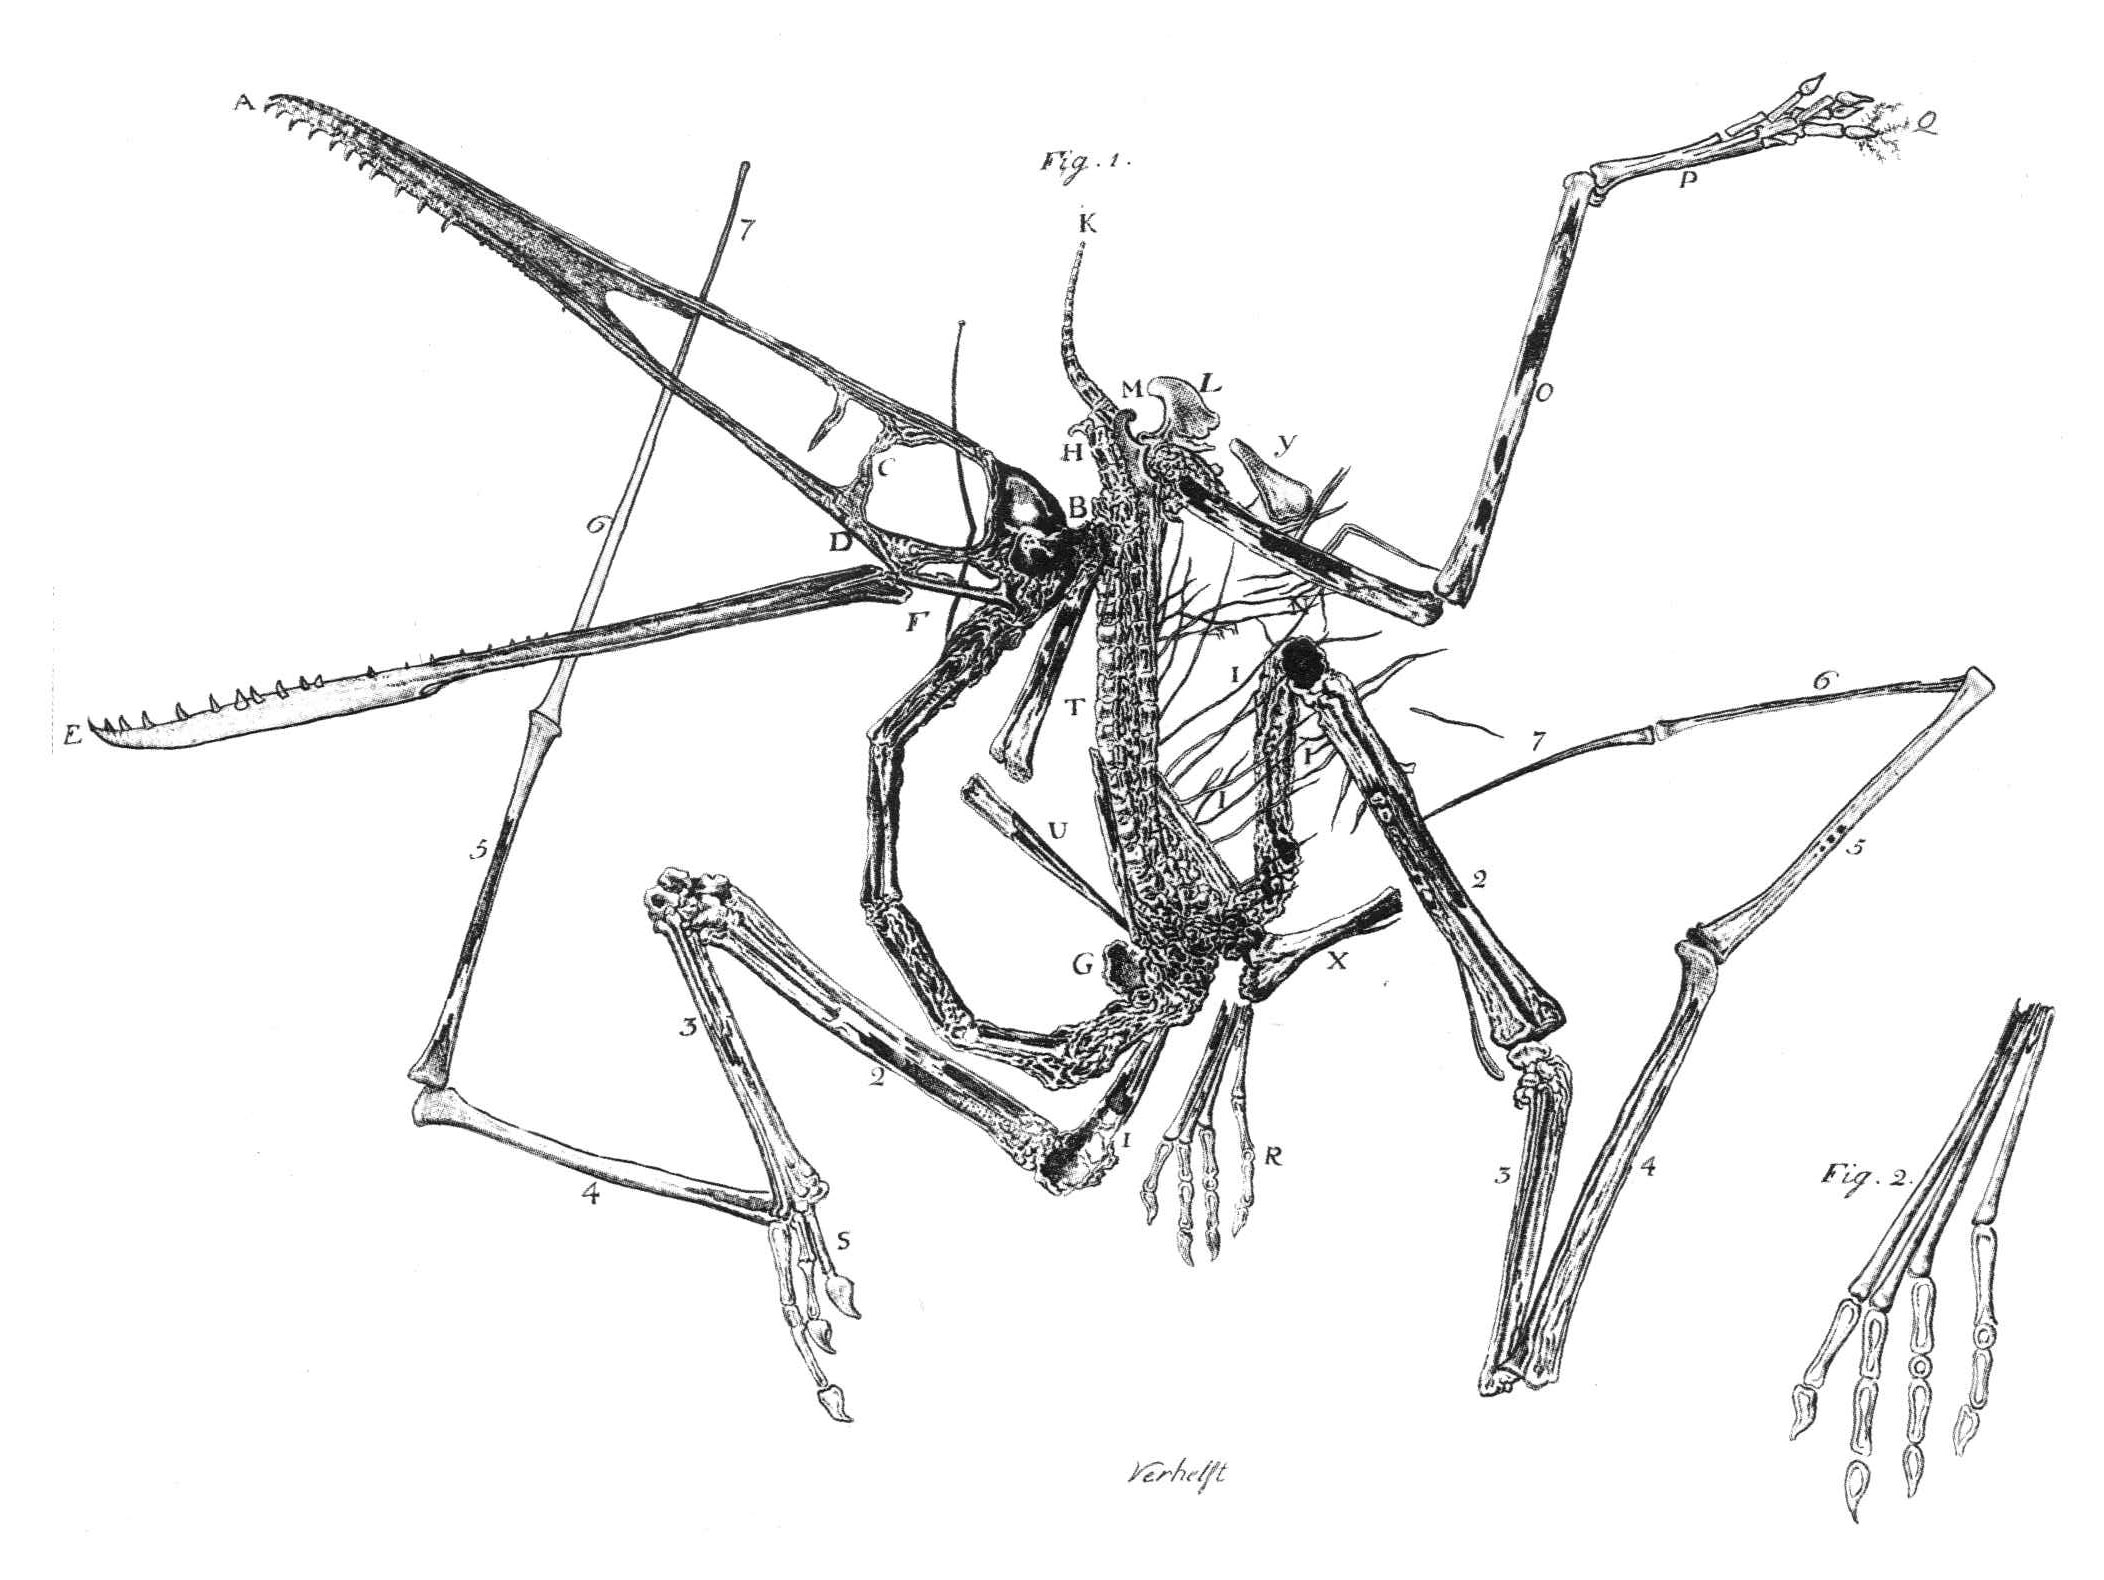 https://upload.wikimedia.org/wikipedia/commons/c/cf/Pterodactylus_holotype_Collini_1784.jpg